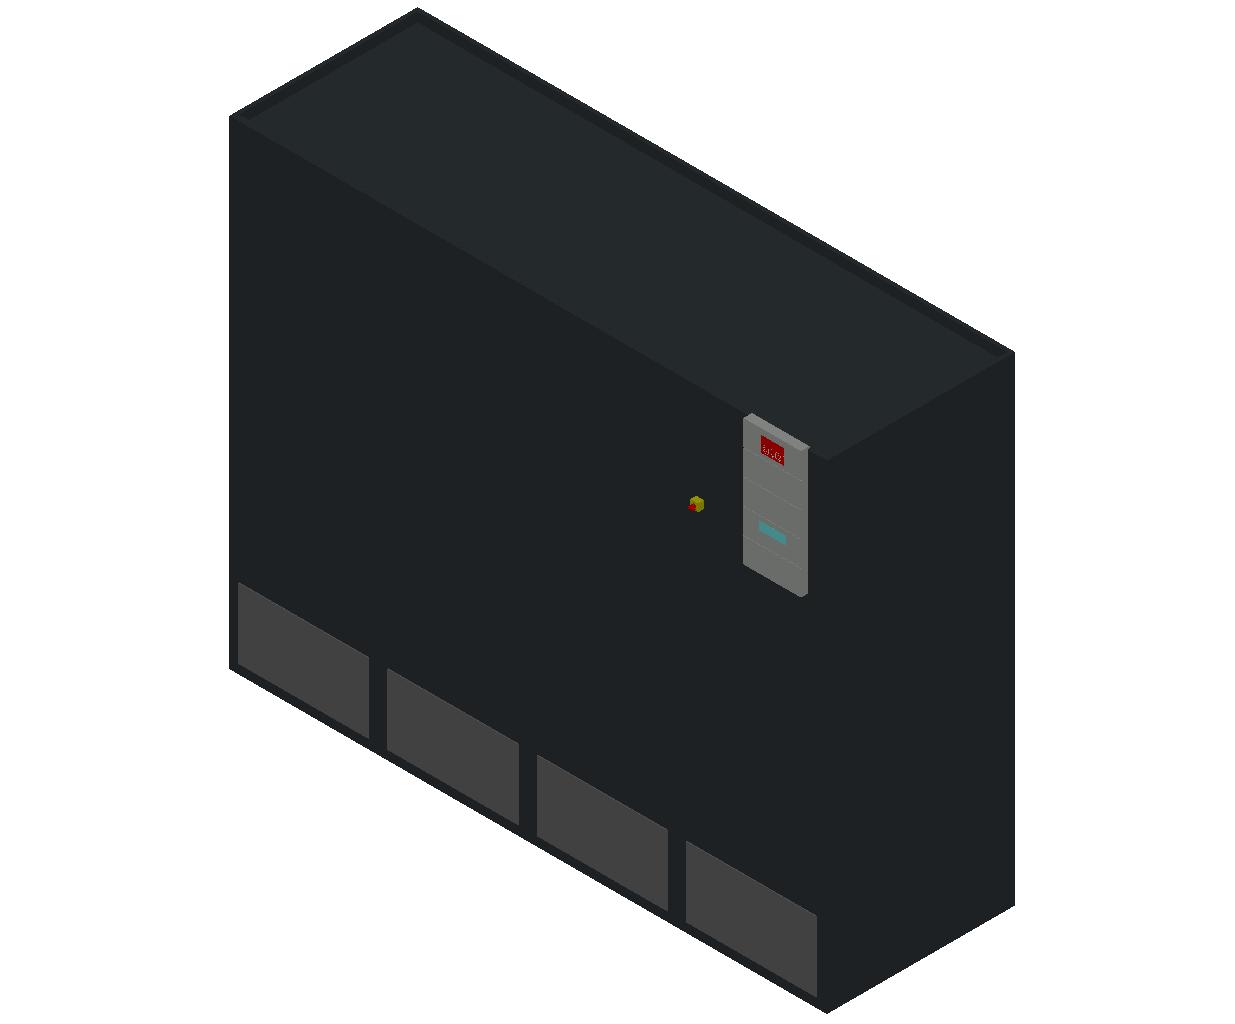 HC_Air Conditioner_Indoor Unit_MEPcontent_STULZ_CyberAir 3PRO_ALR_Dual Circuit GES_ALR_1092_GES_INT-EN.dwg